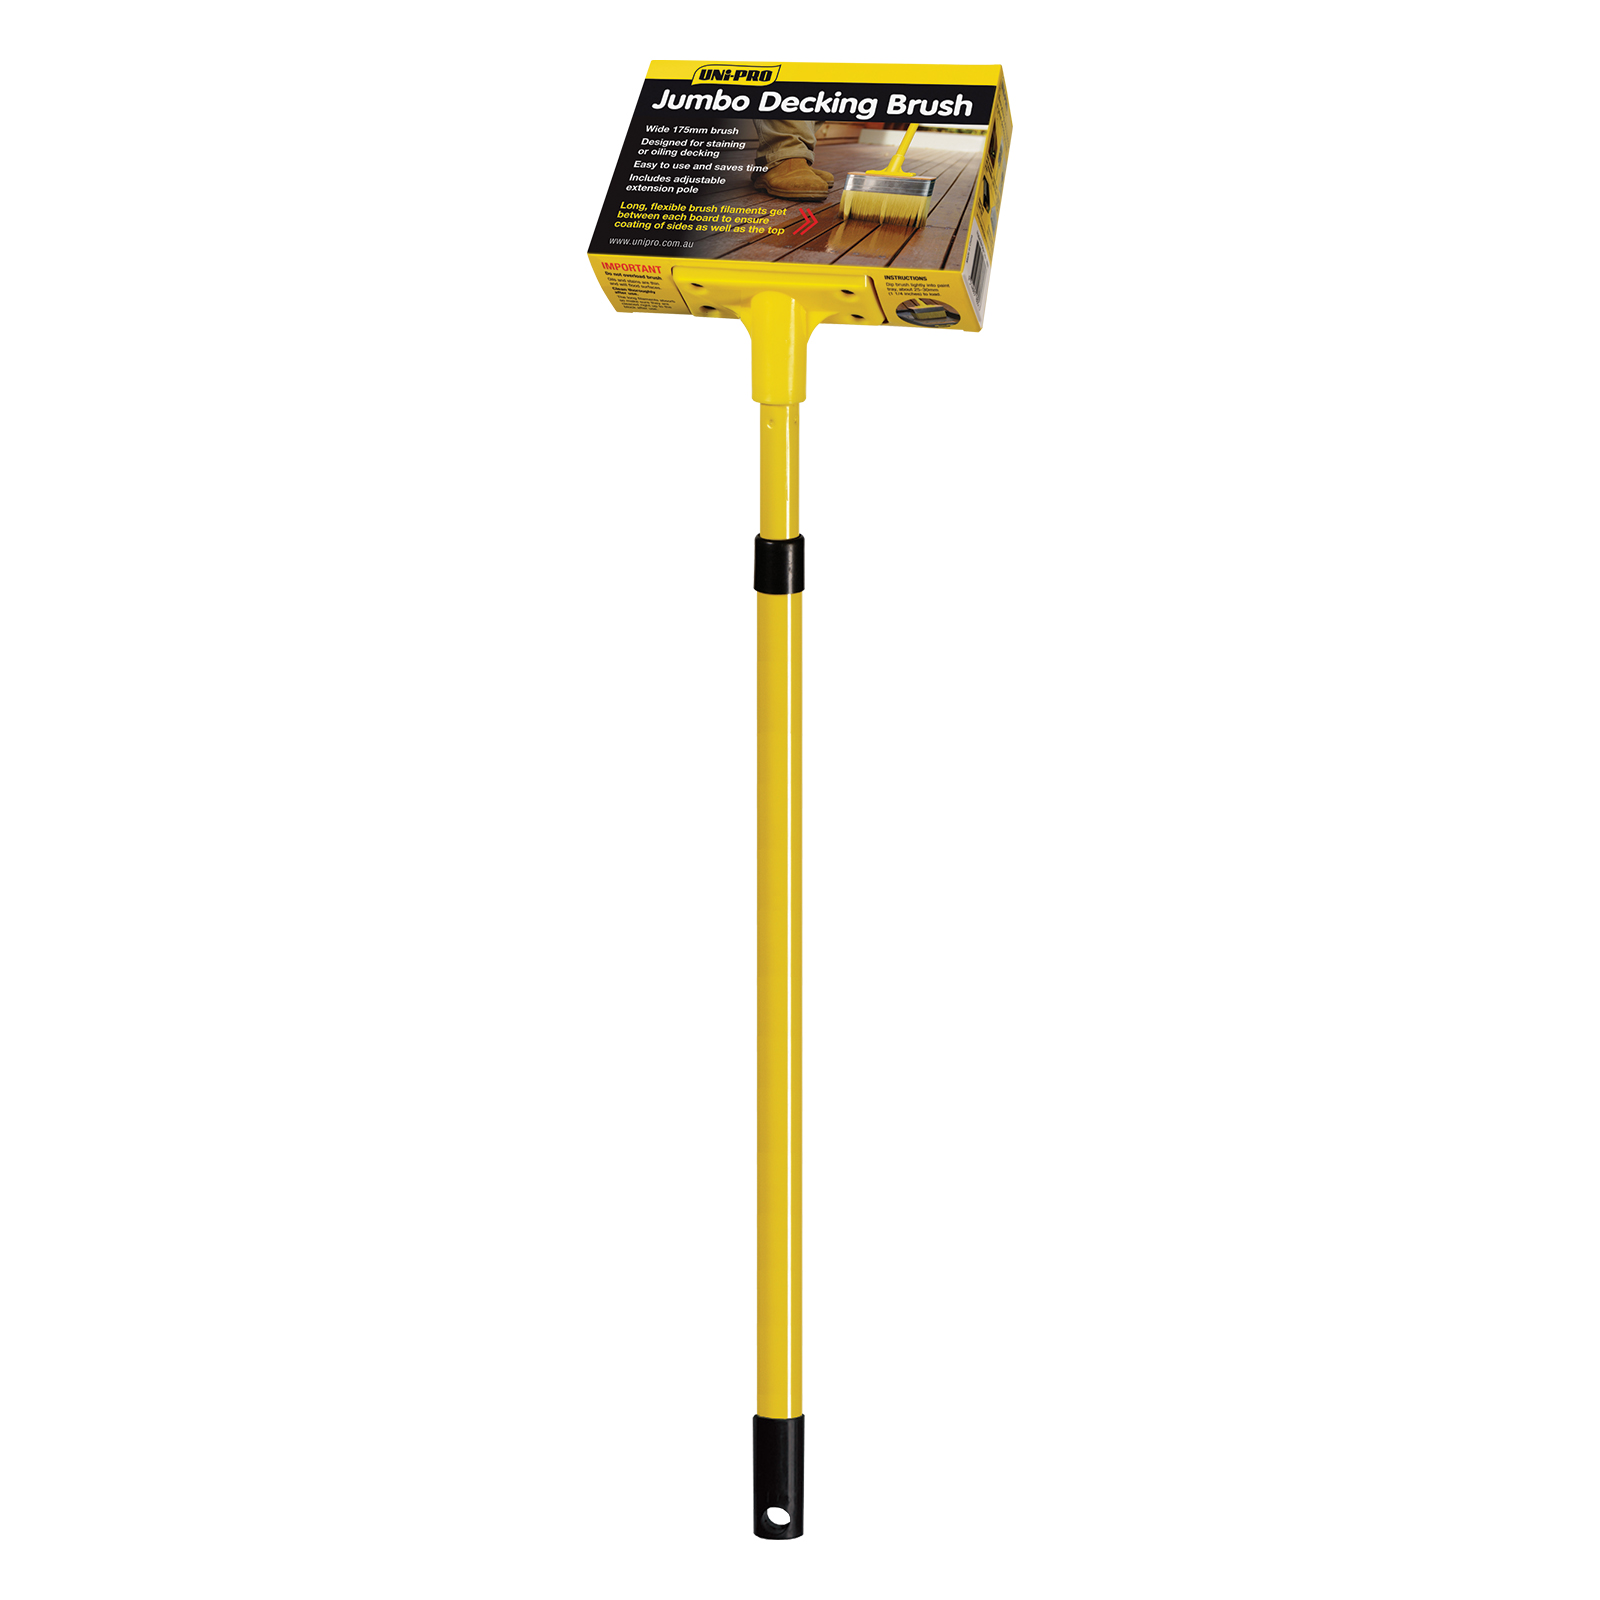 Jumbo Decking Brush (with adjustable pole)